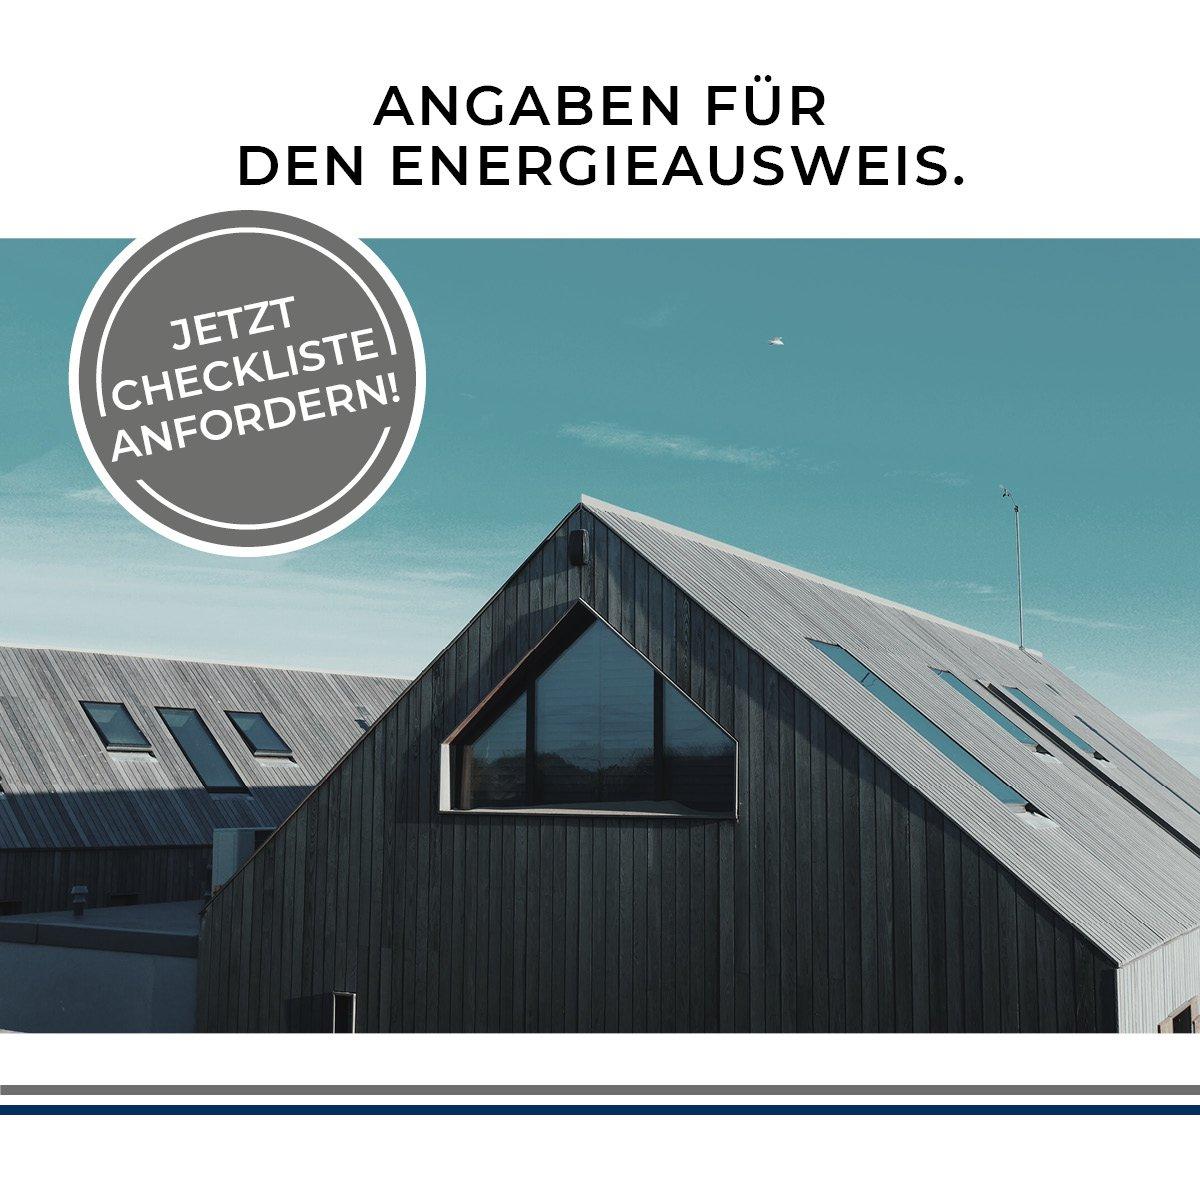 Angaben zum Energieausweis in Minden, Porta Westfalica, Bielefeld